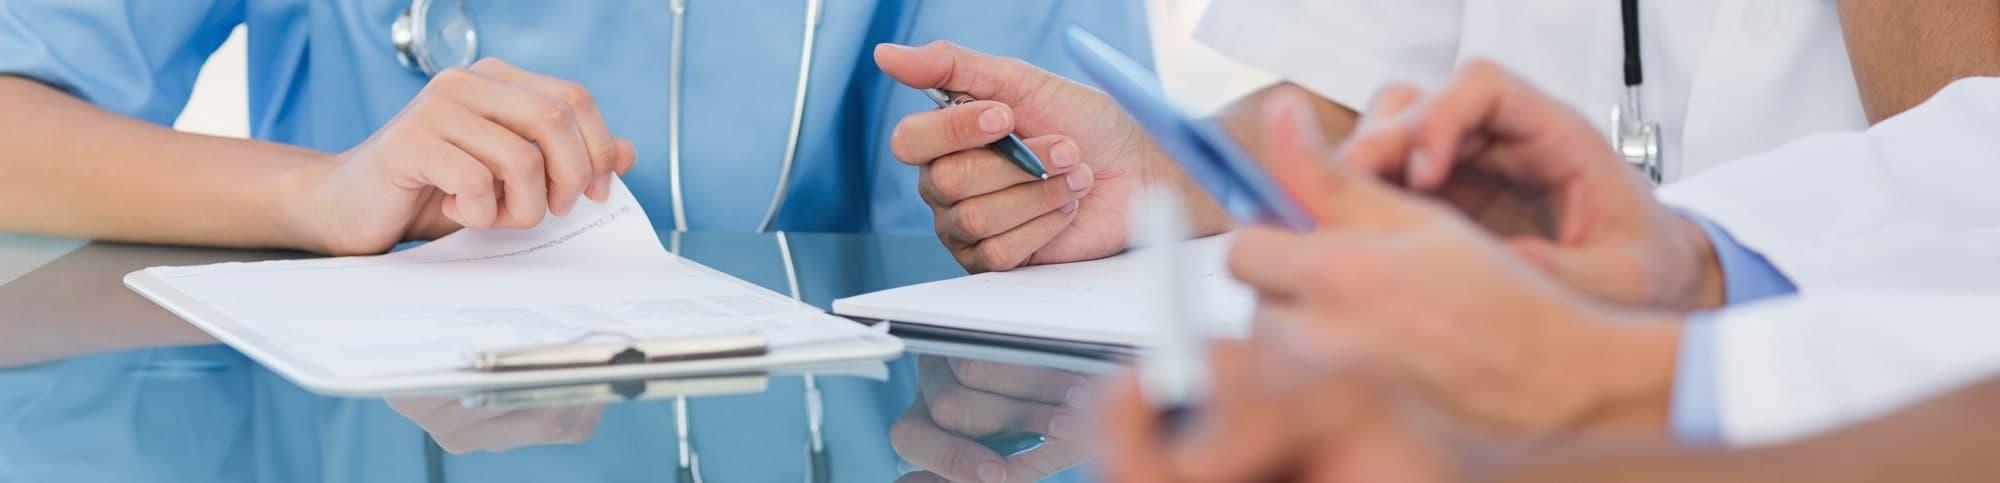 Papilloma cryopharma kezelése | PapiSTOP